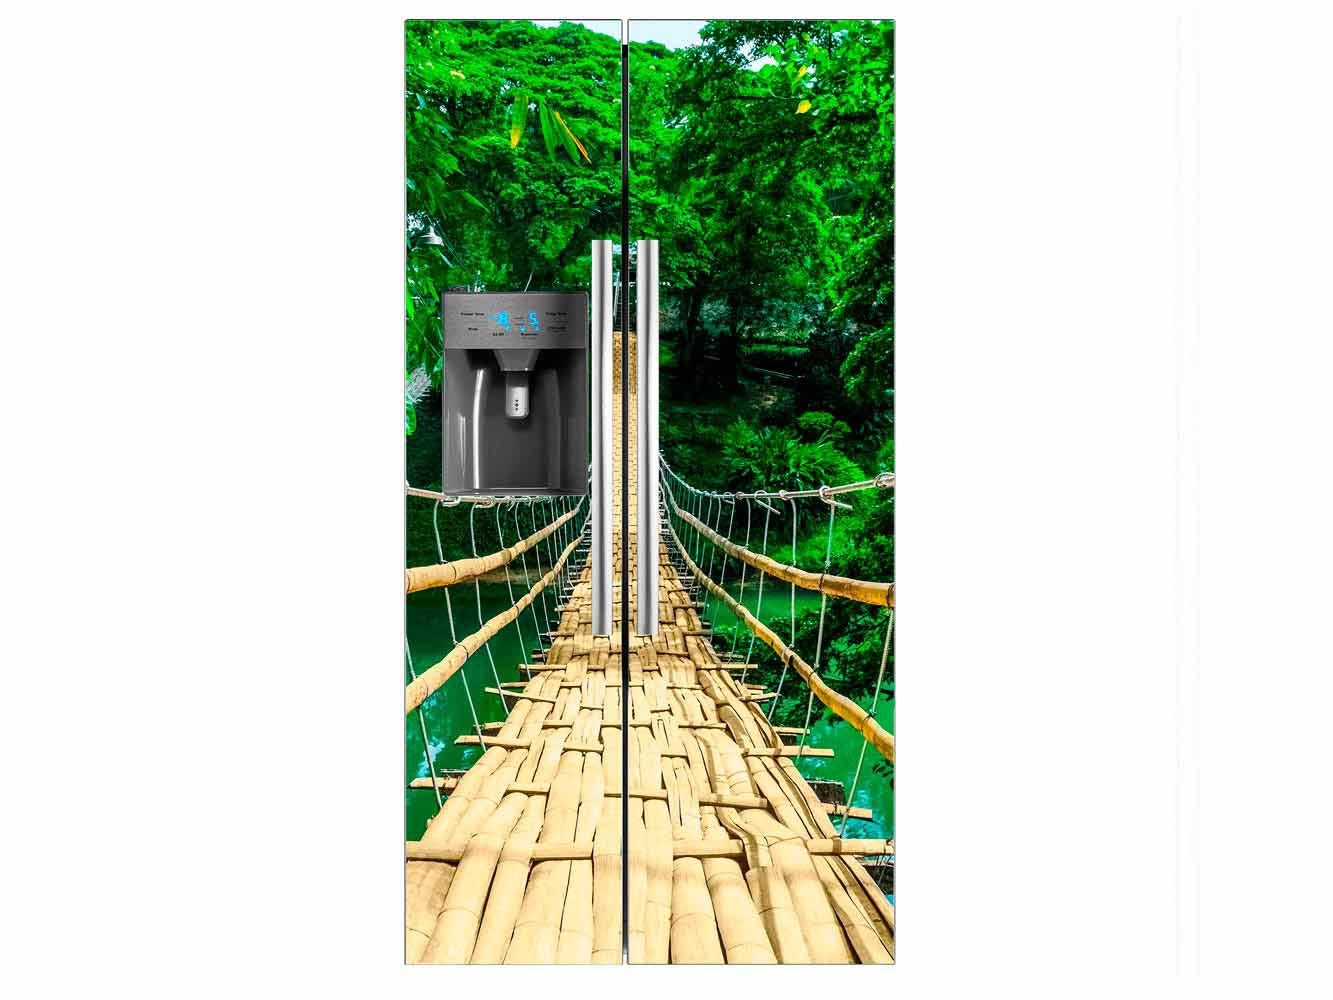 Vinilo Frigorífico Puente Río | Carteles XXL - Impresión carteleria publicitaria